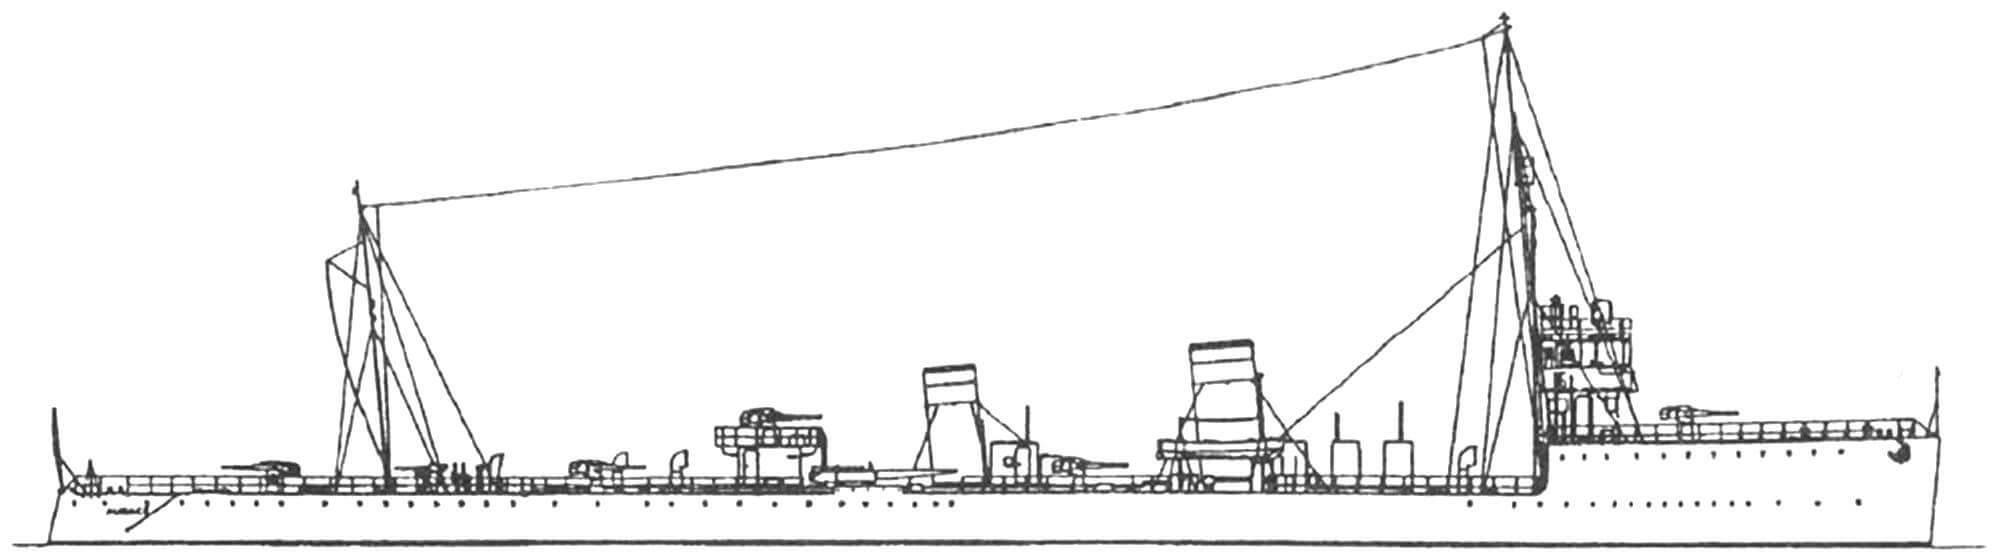 "189. Эсминец ""Аудаче"" (II), Италия, 1916 г."